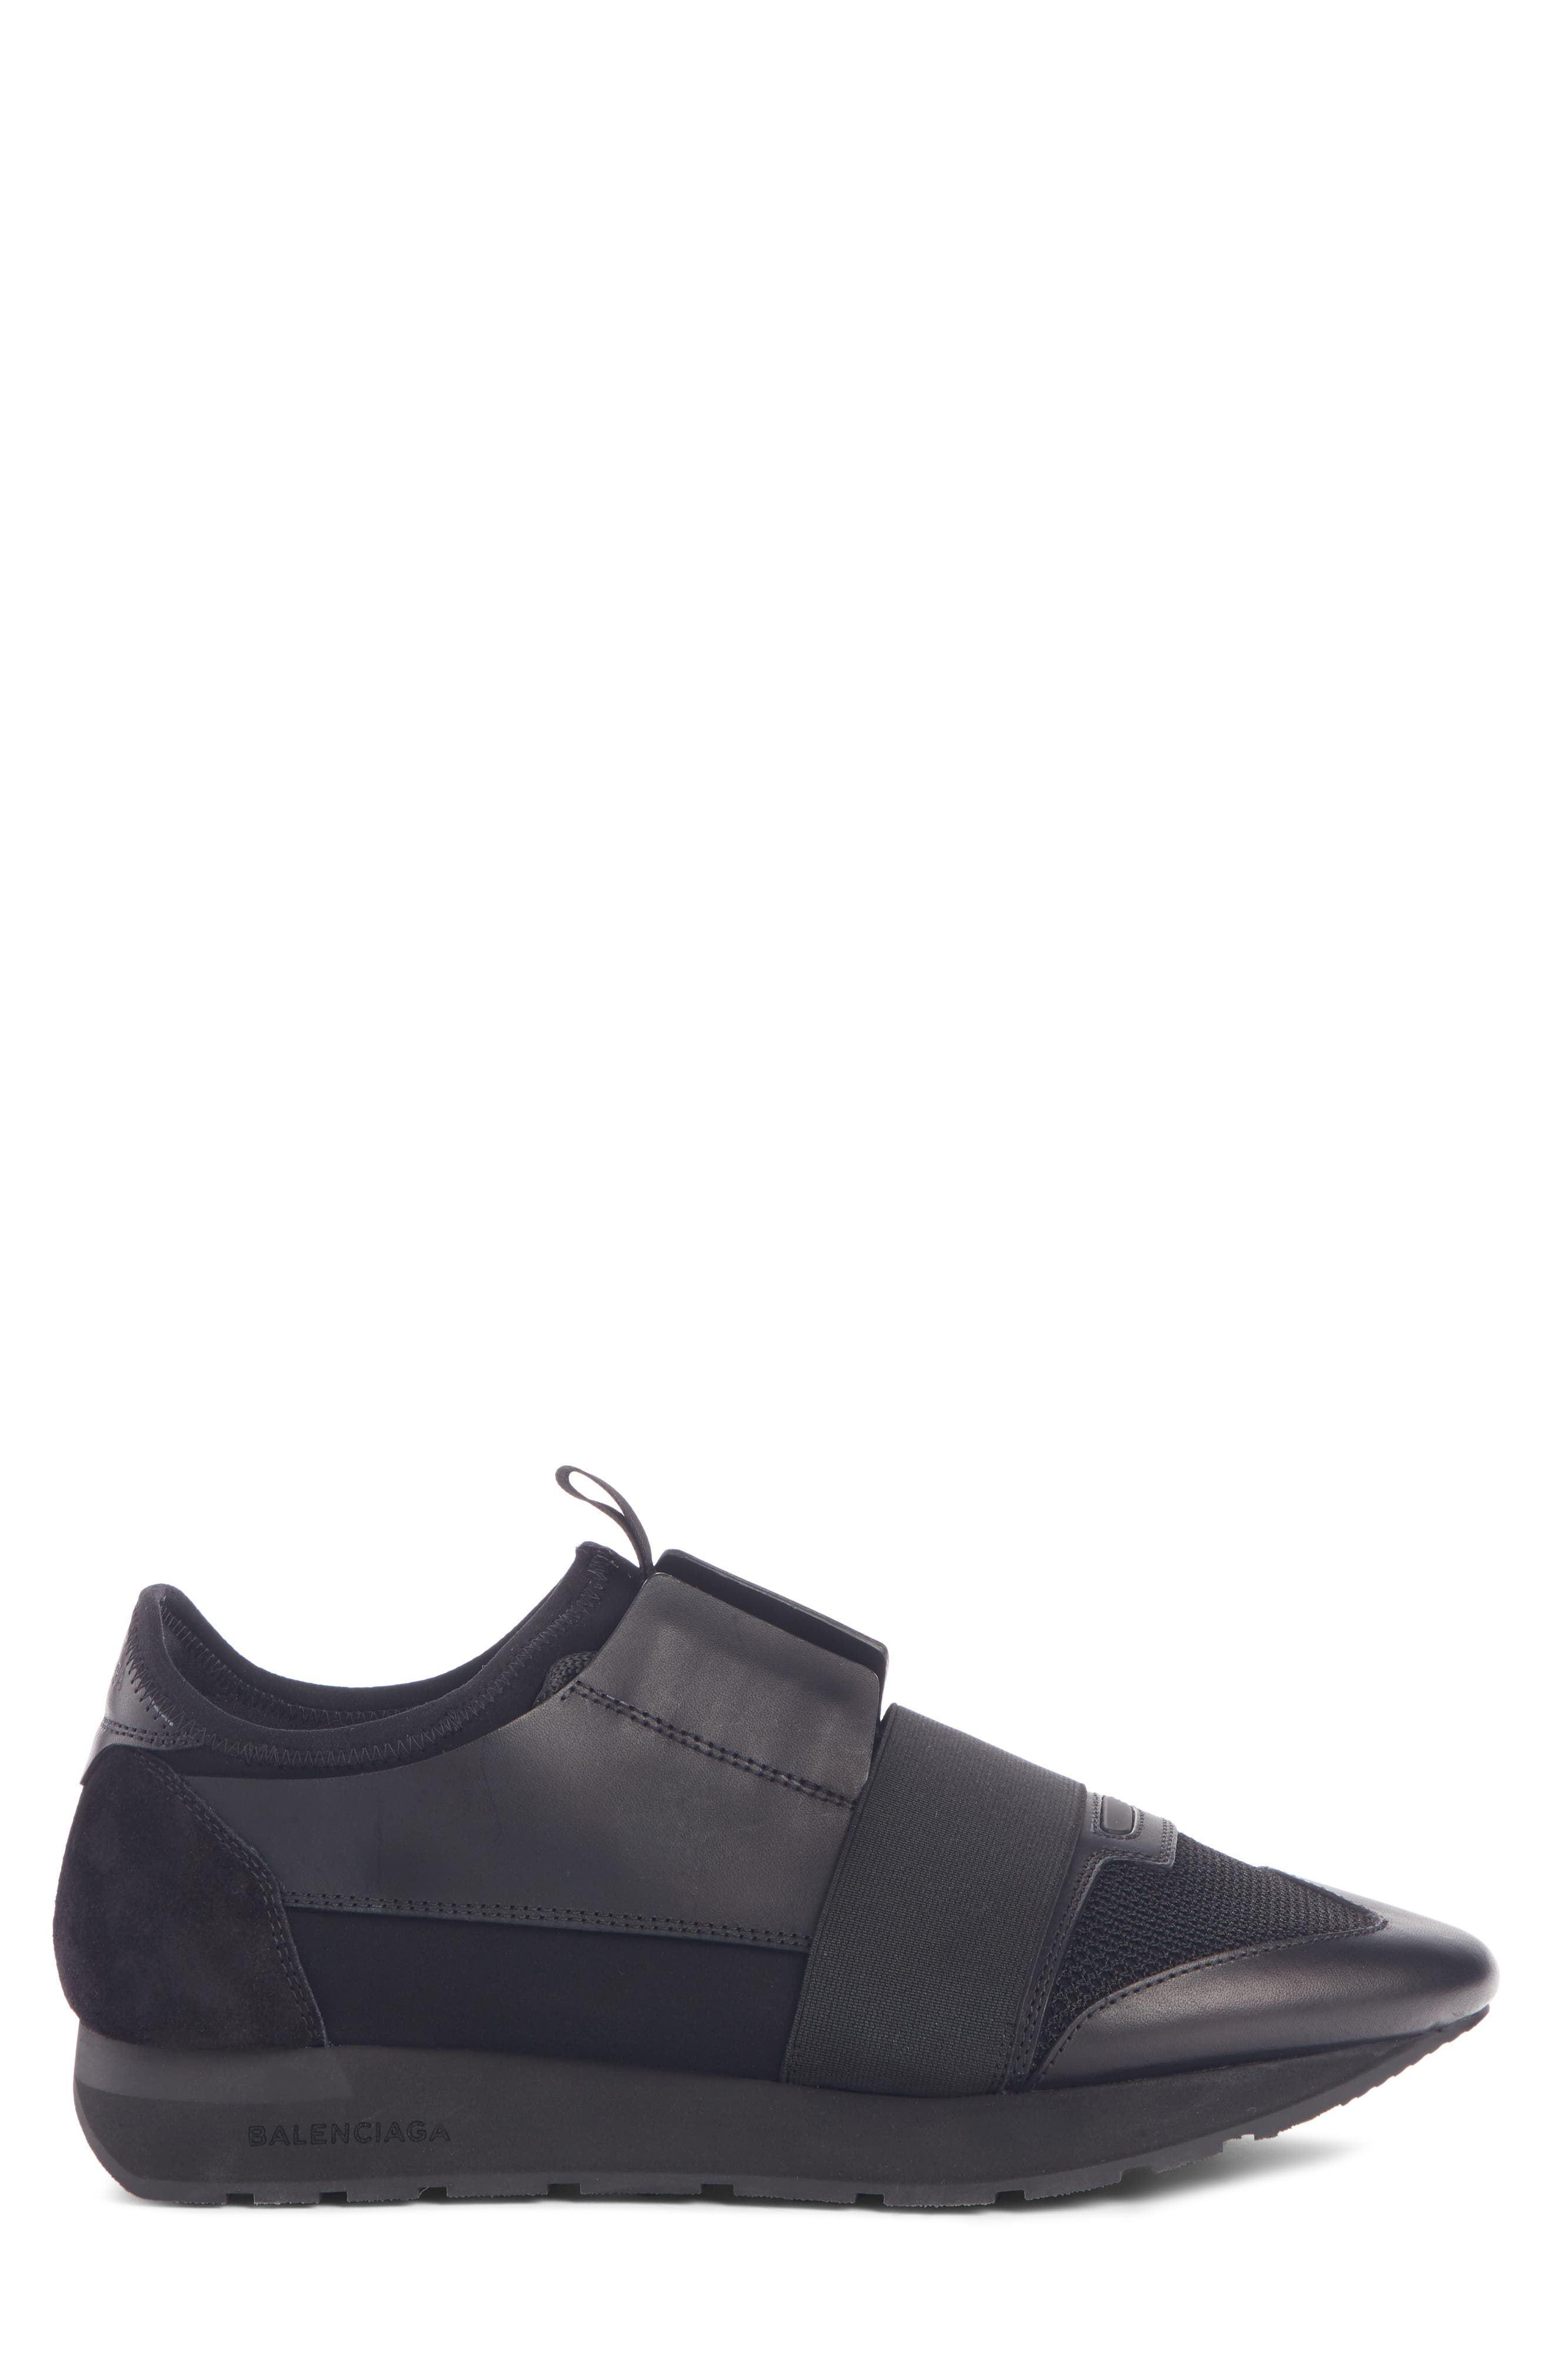 BALENCIAGA, Race Runner Sneaker, Alternate thumbnail 3, color, BLACK/ BLACK/ BLACK